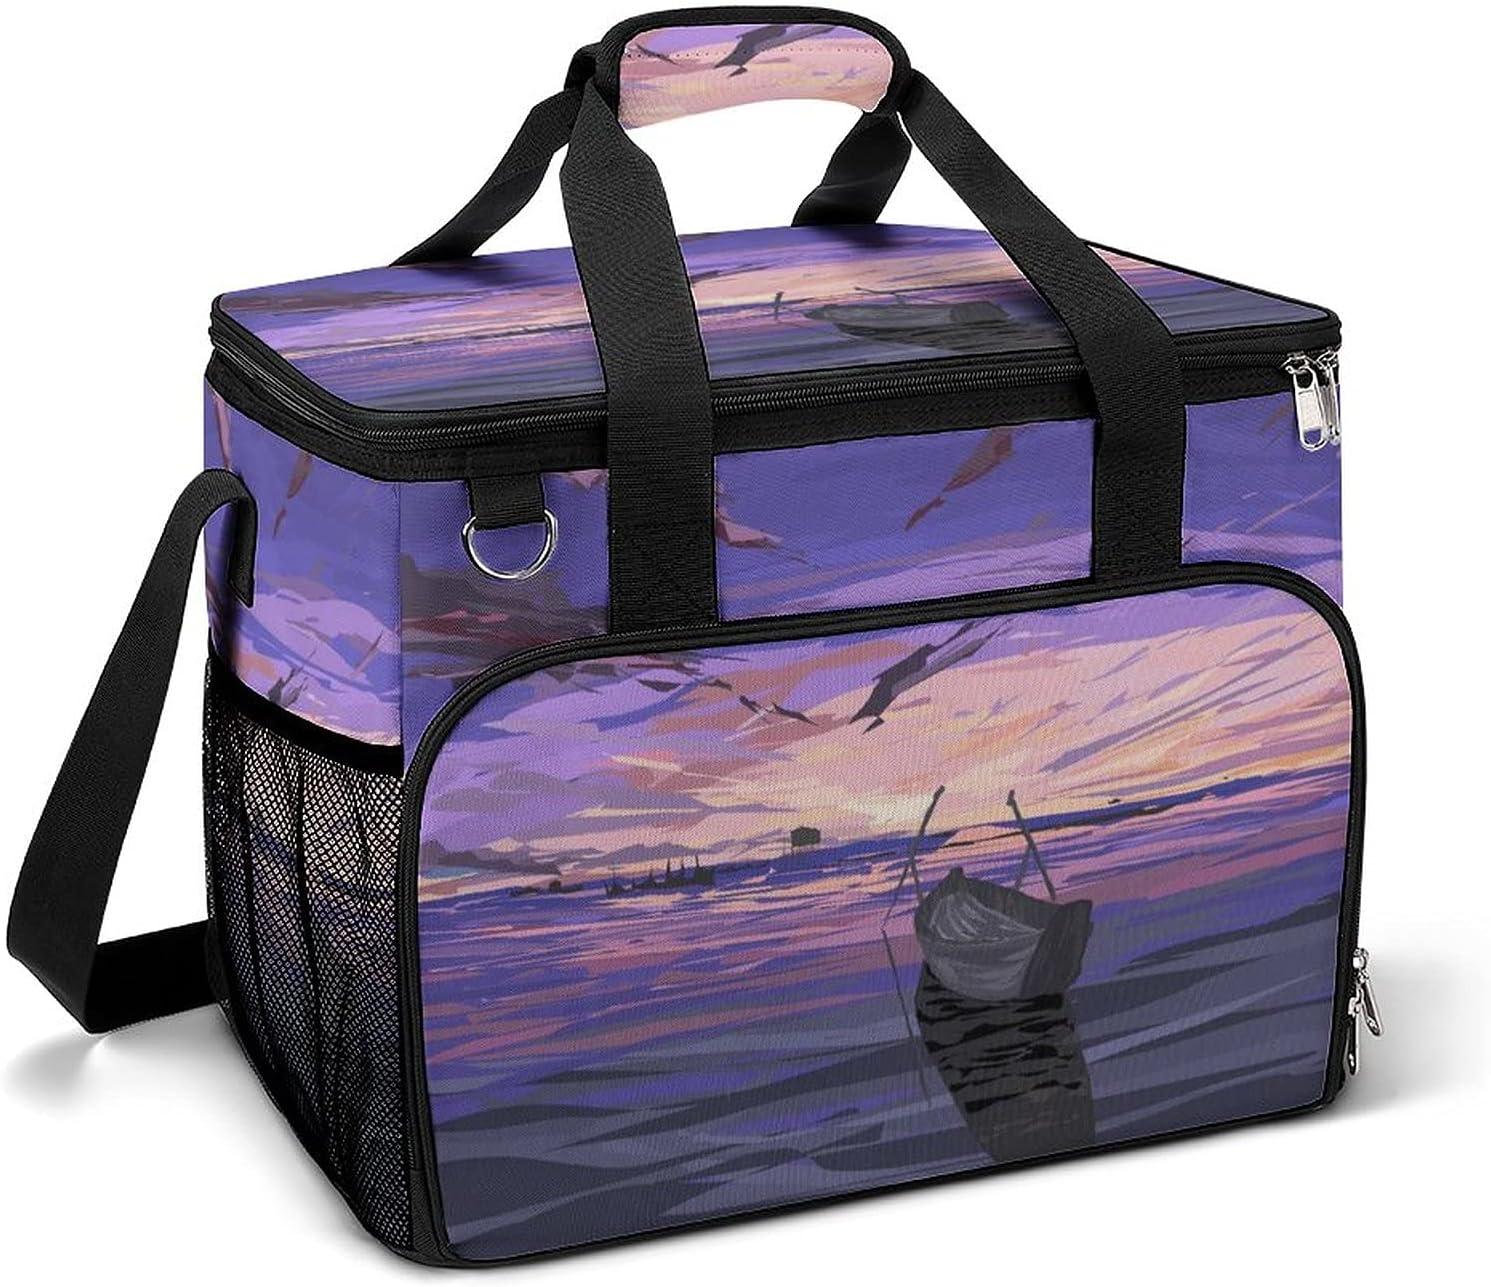 Cooler Ice Fashion Bag Sunset Sky Large Pattern Custom Capacity Max 90% OFF Portable